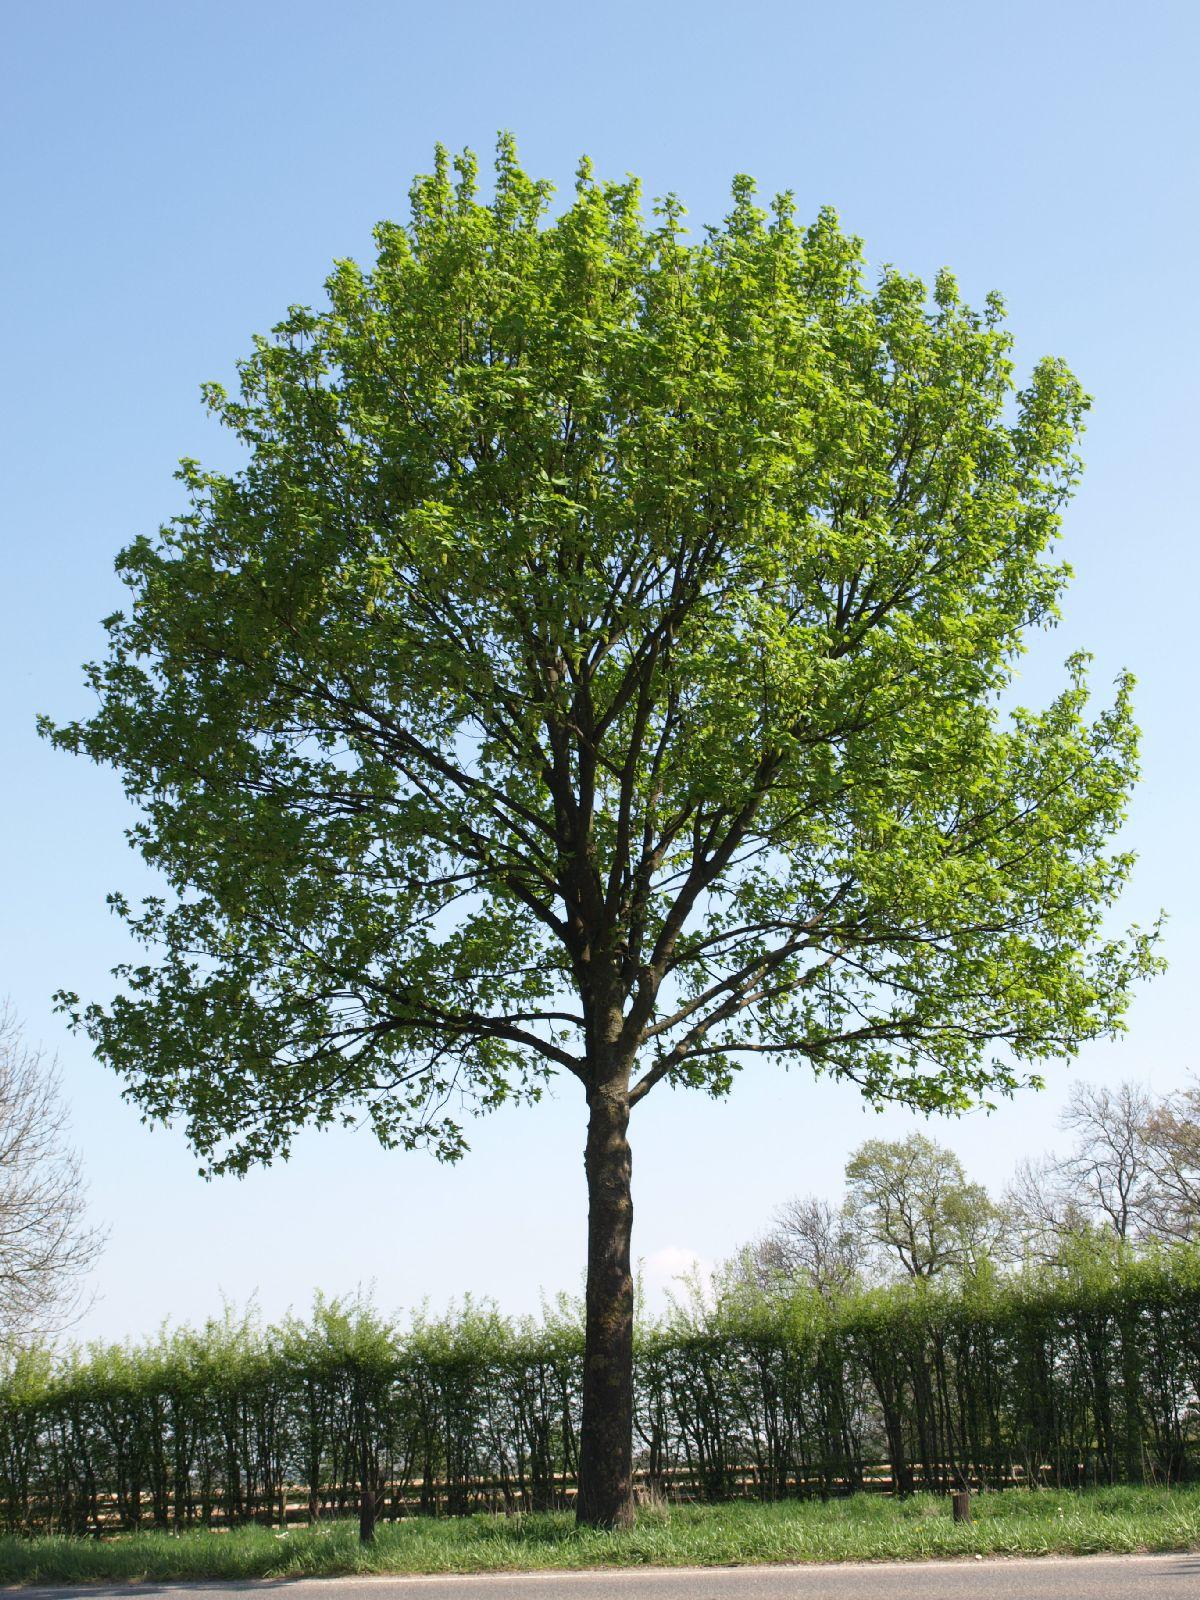 Plants-Trees_Photo_Texture_B_P4212518